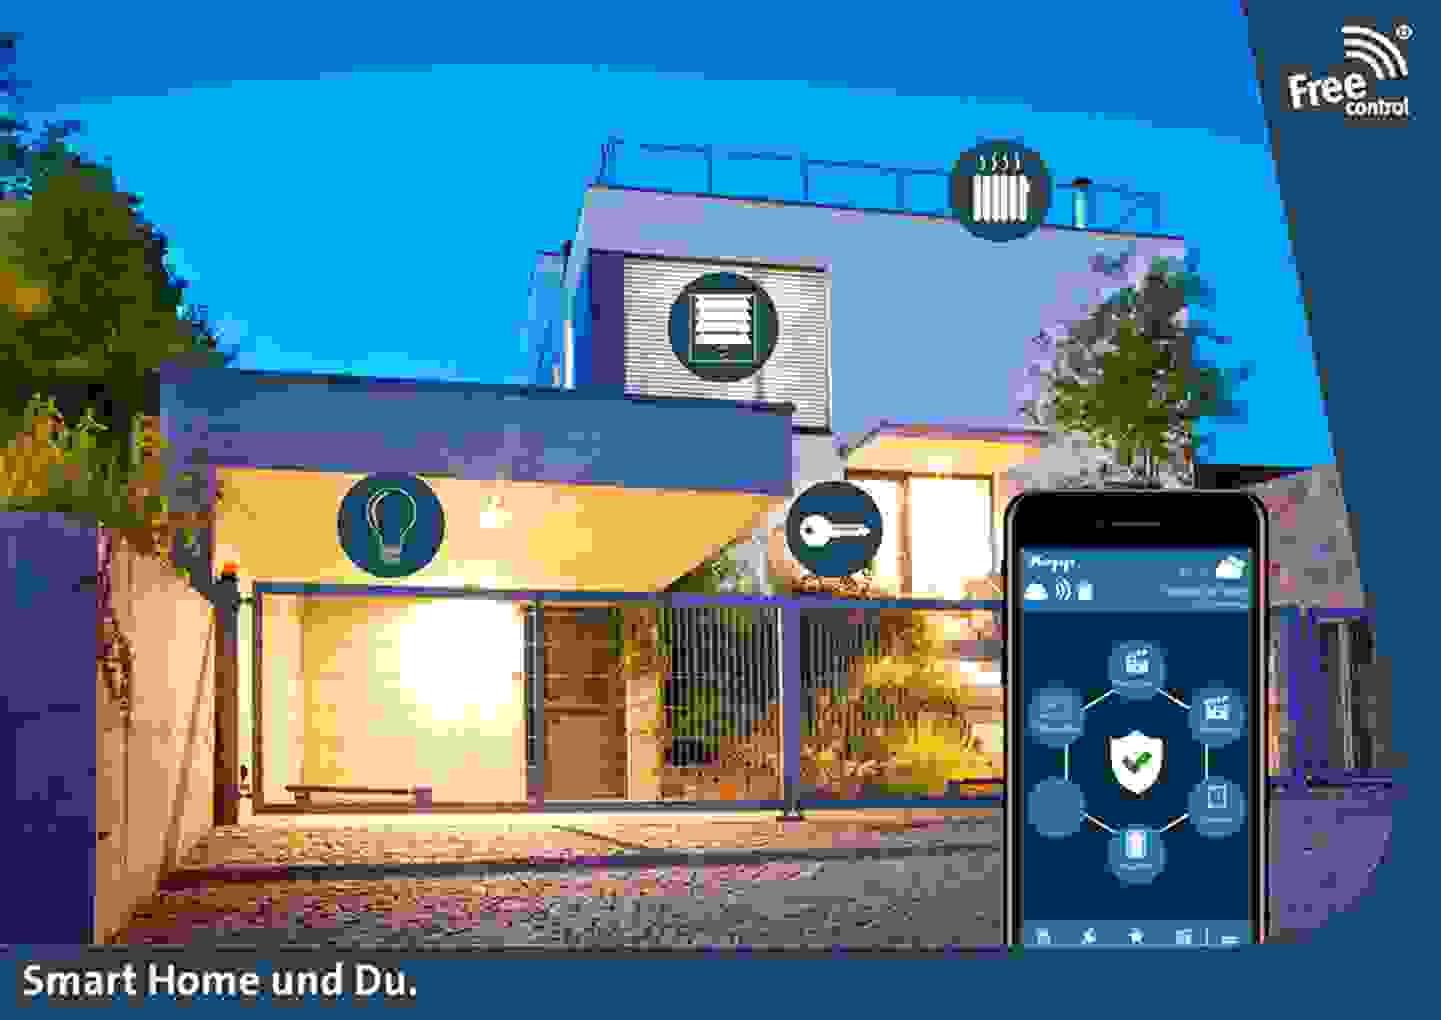 Kopp Smart Home Profi Free-control